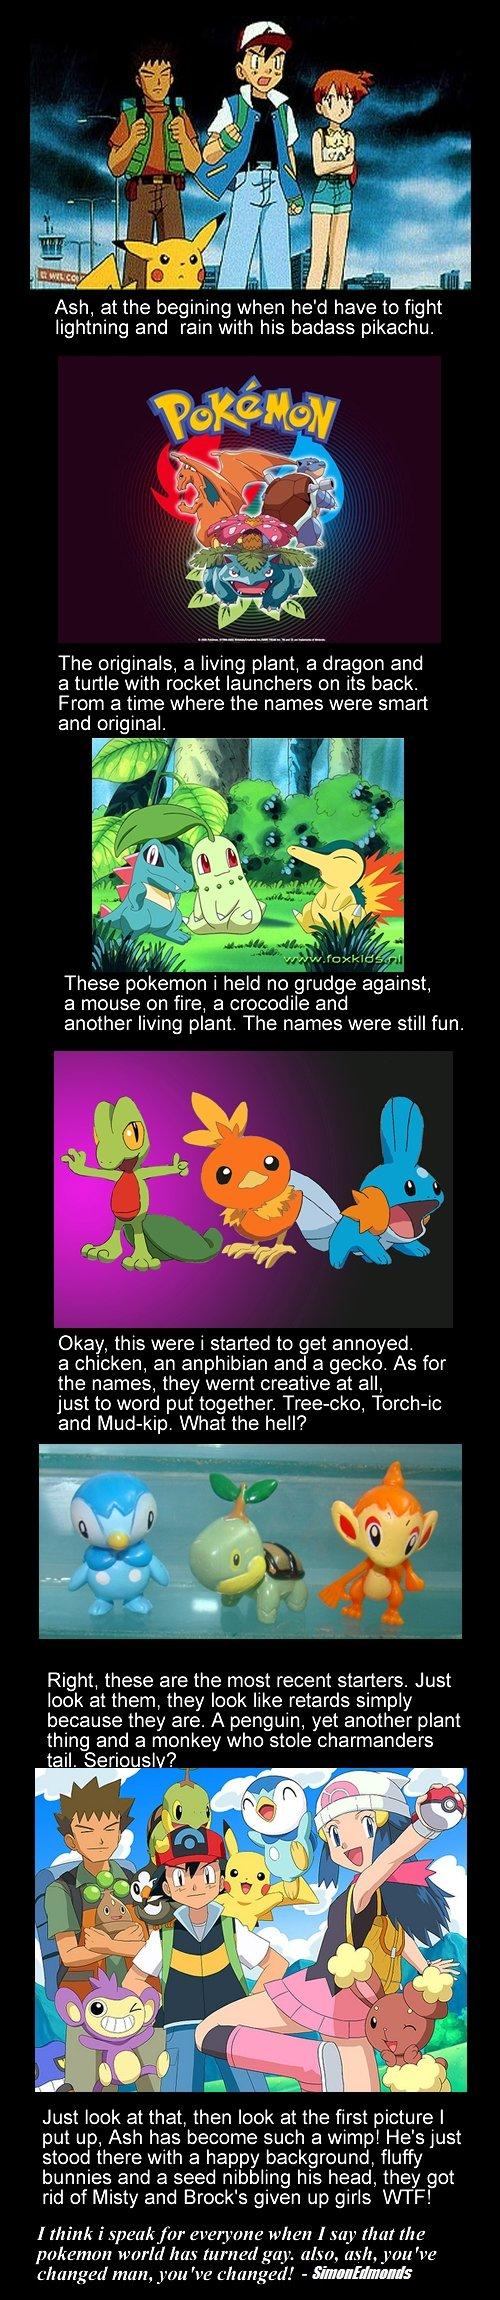 Pokemon The truth